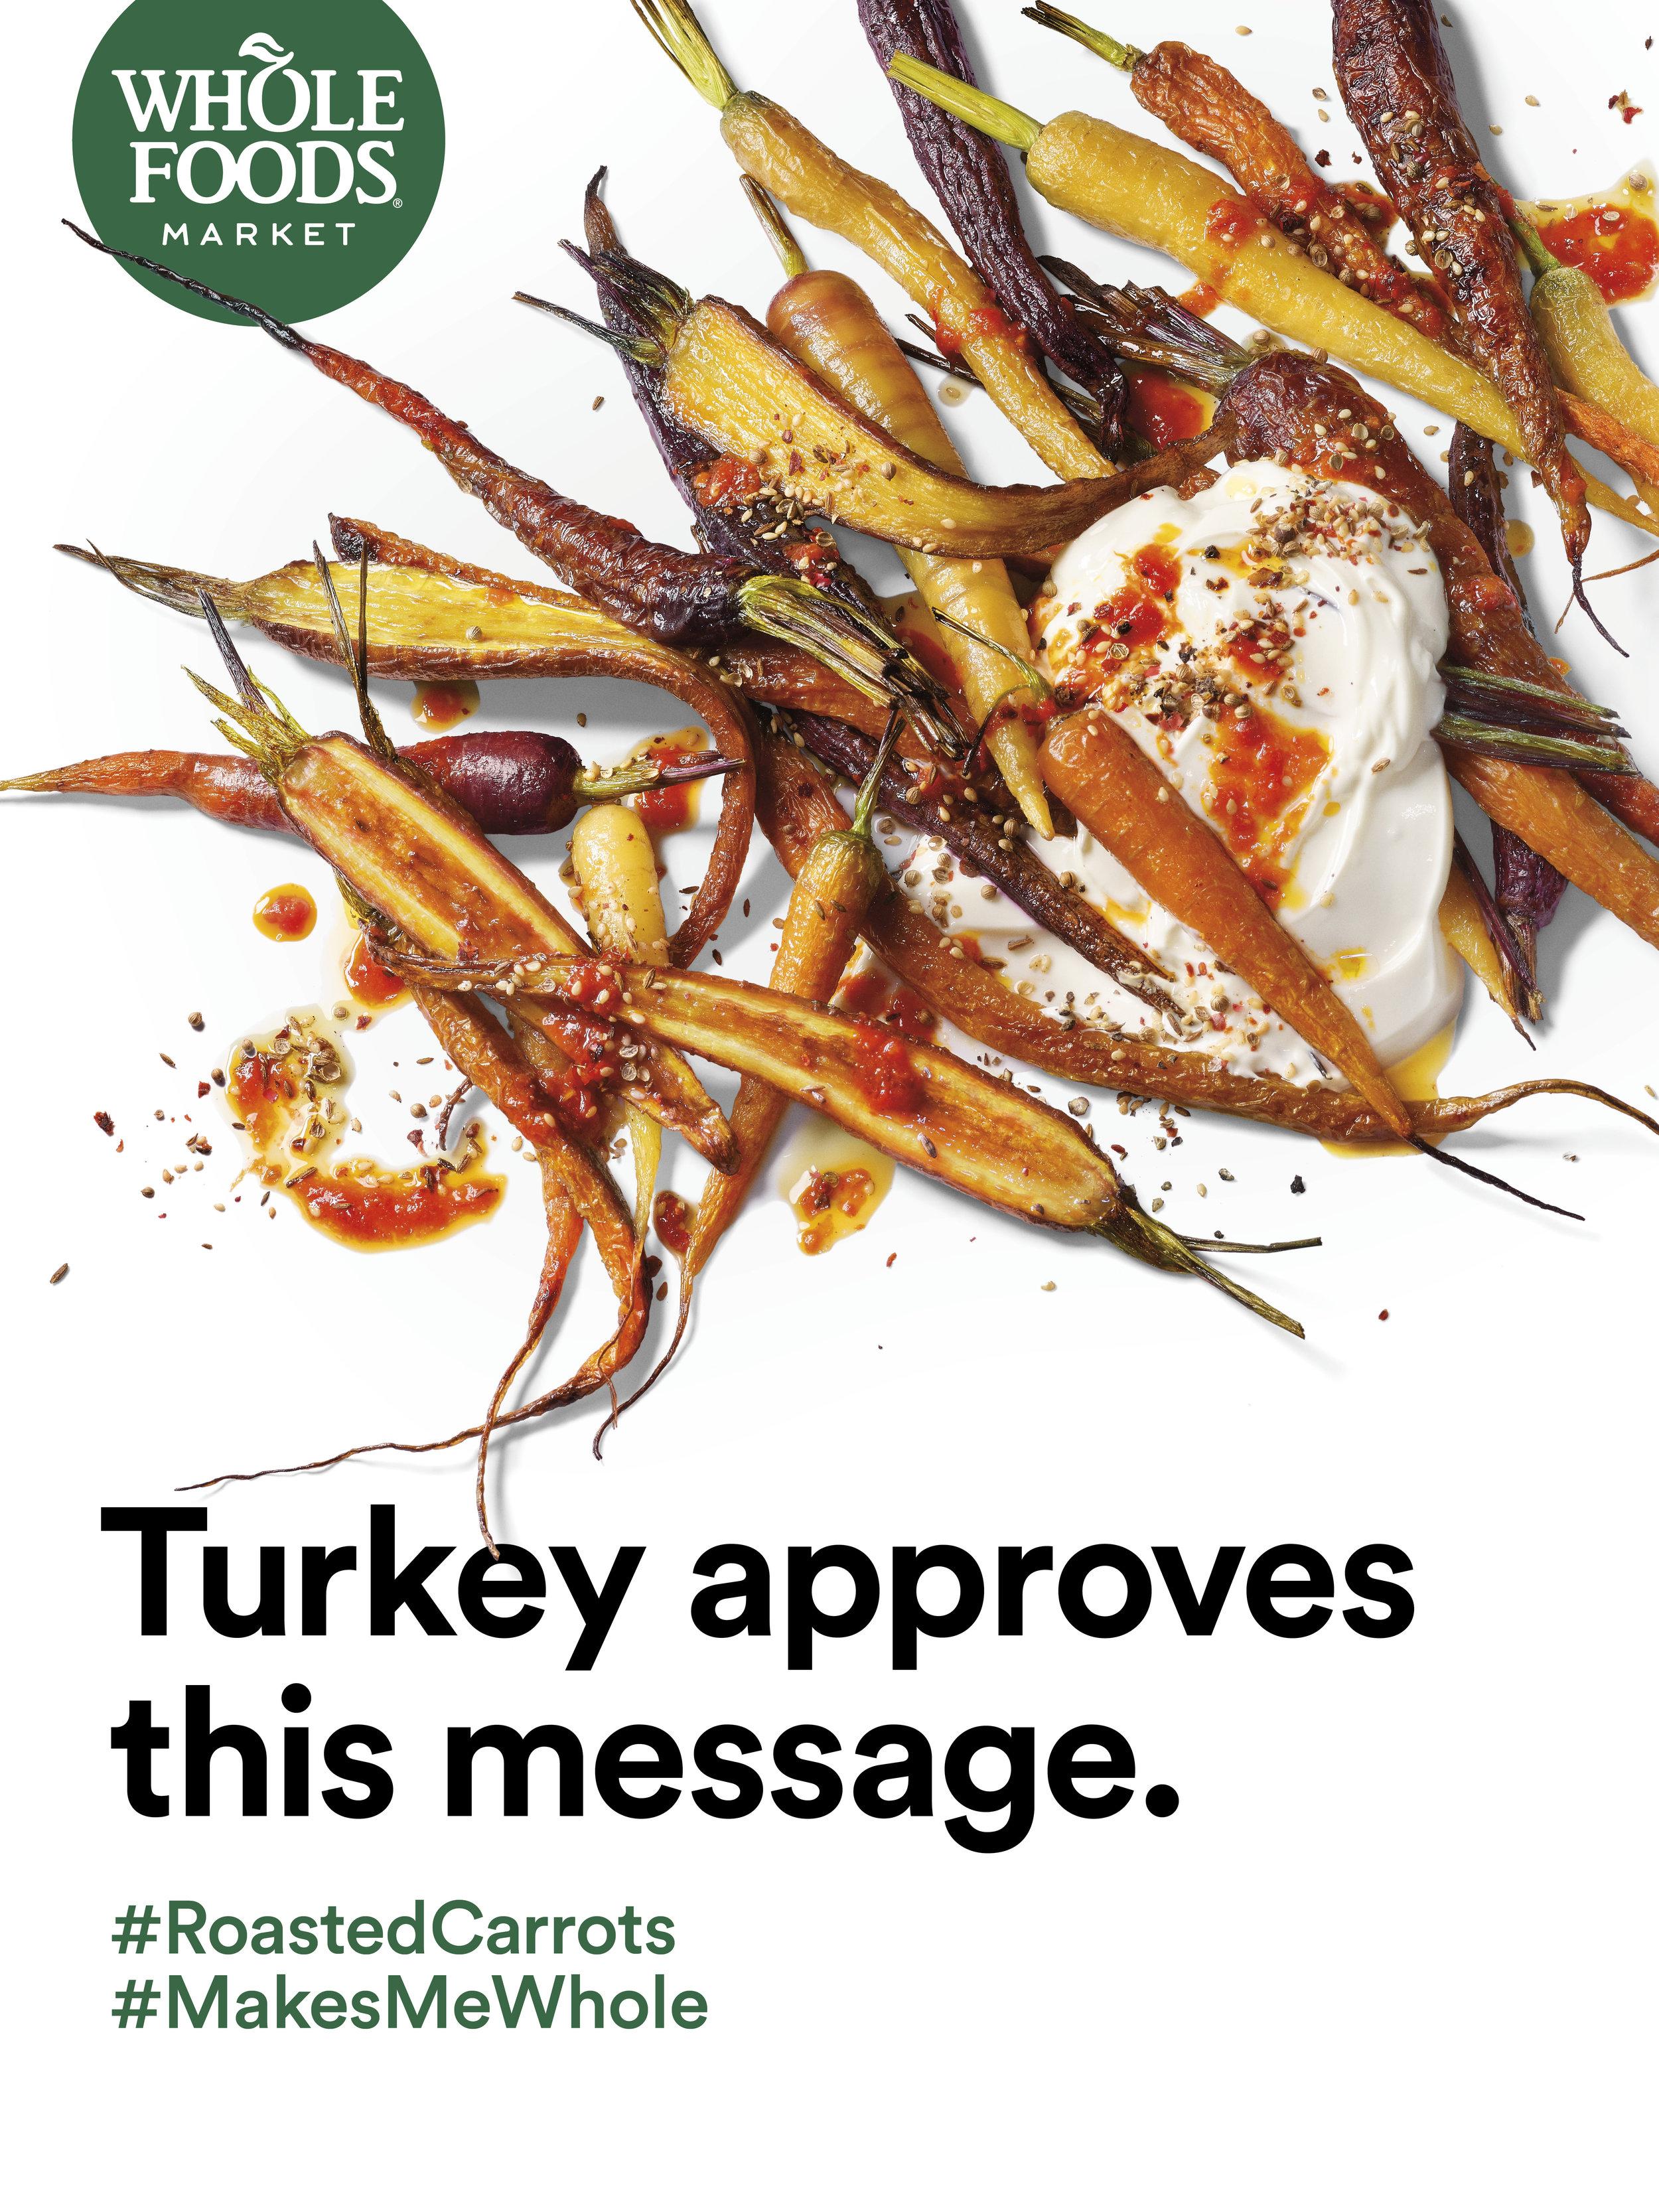 WFM_Harvest_Posters_2018_36x48_Carrots.jpg